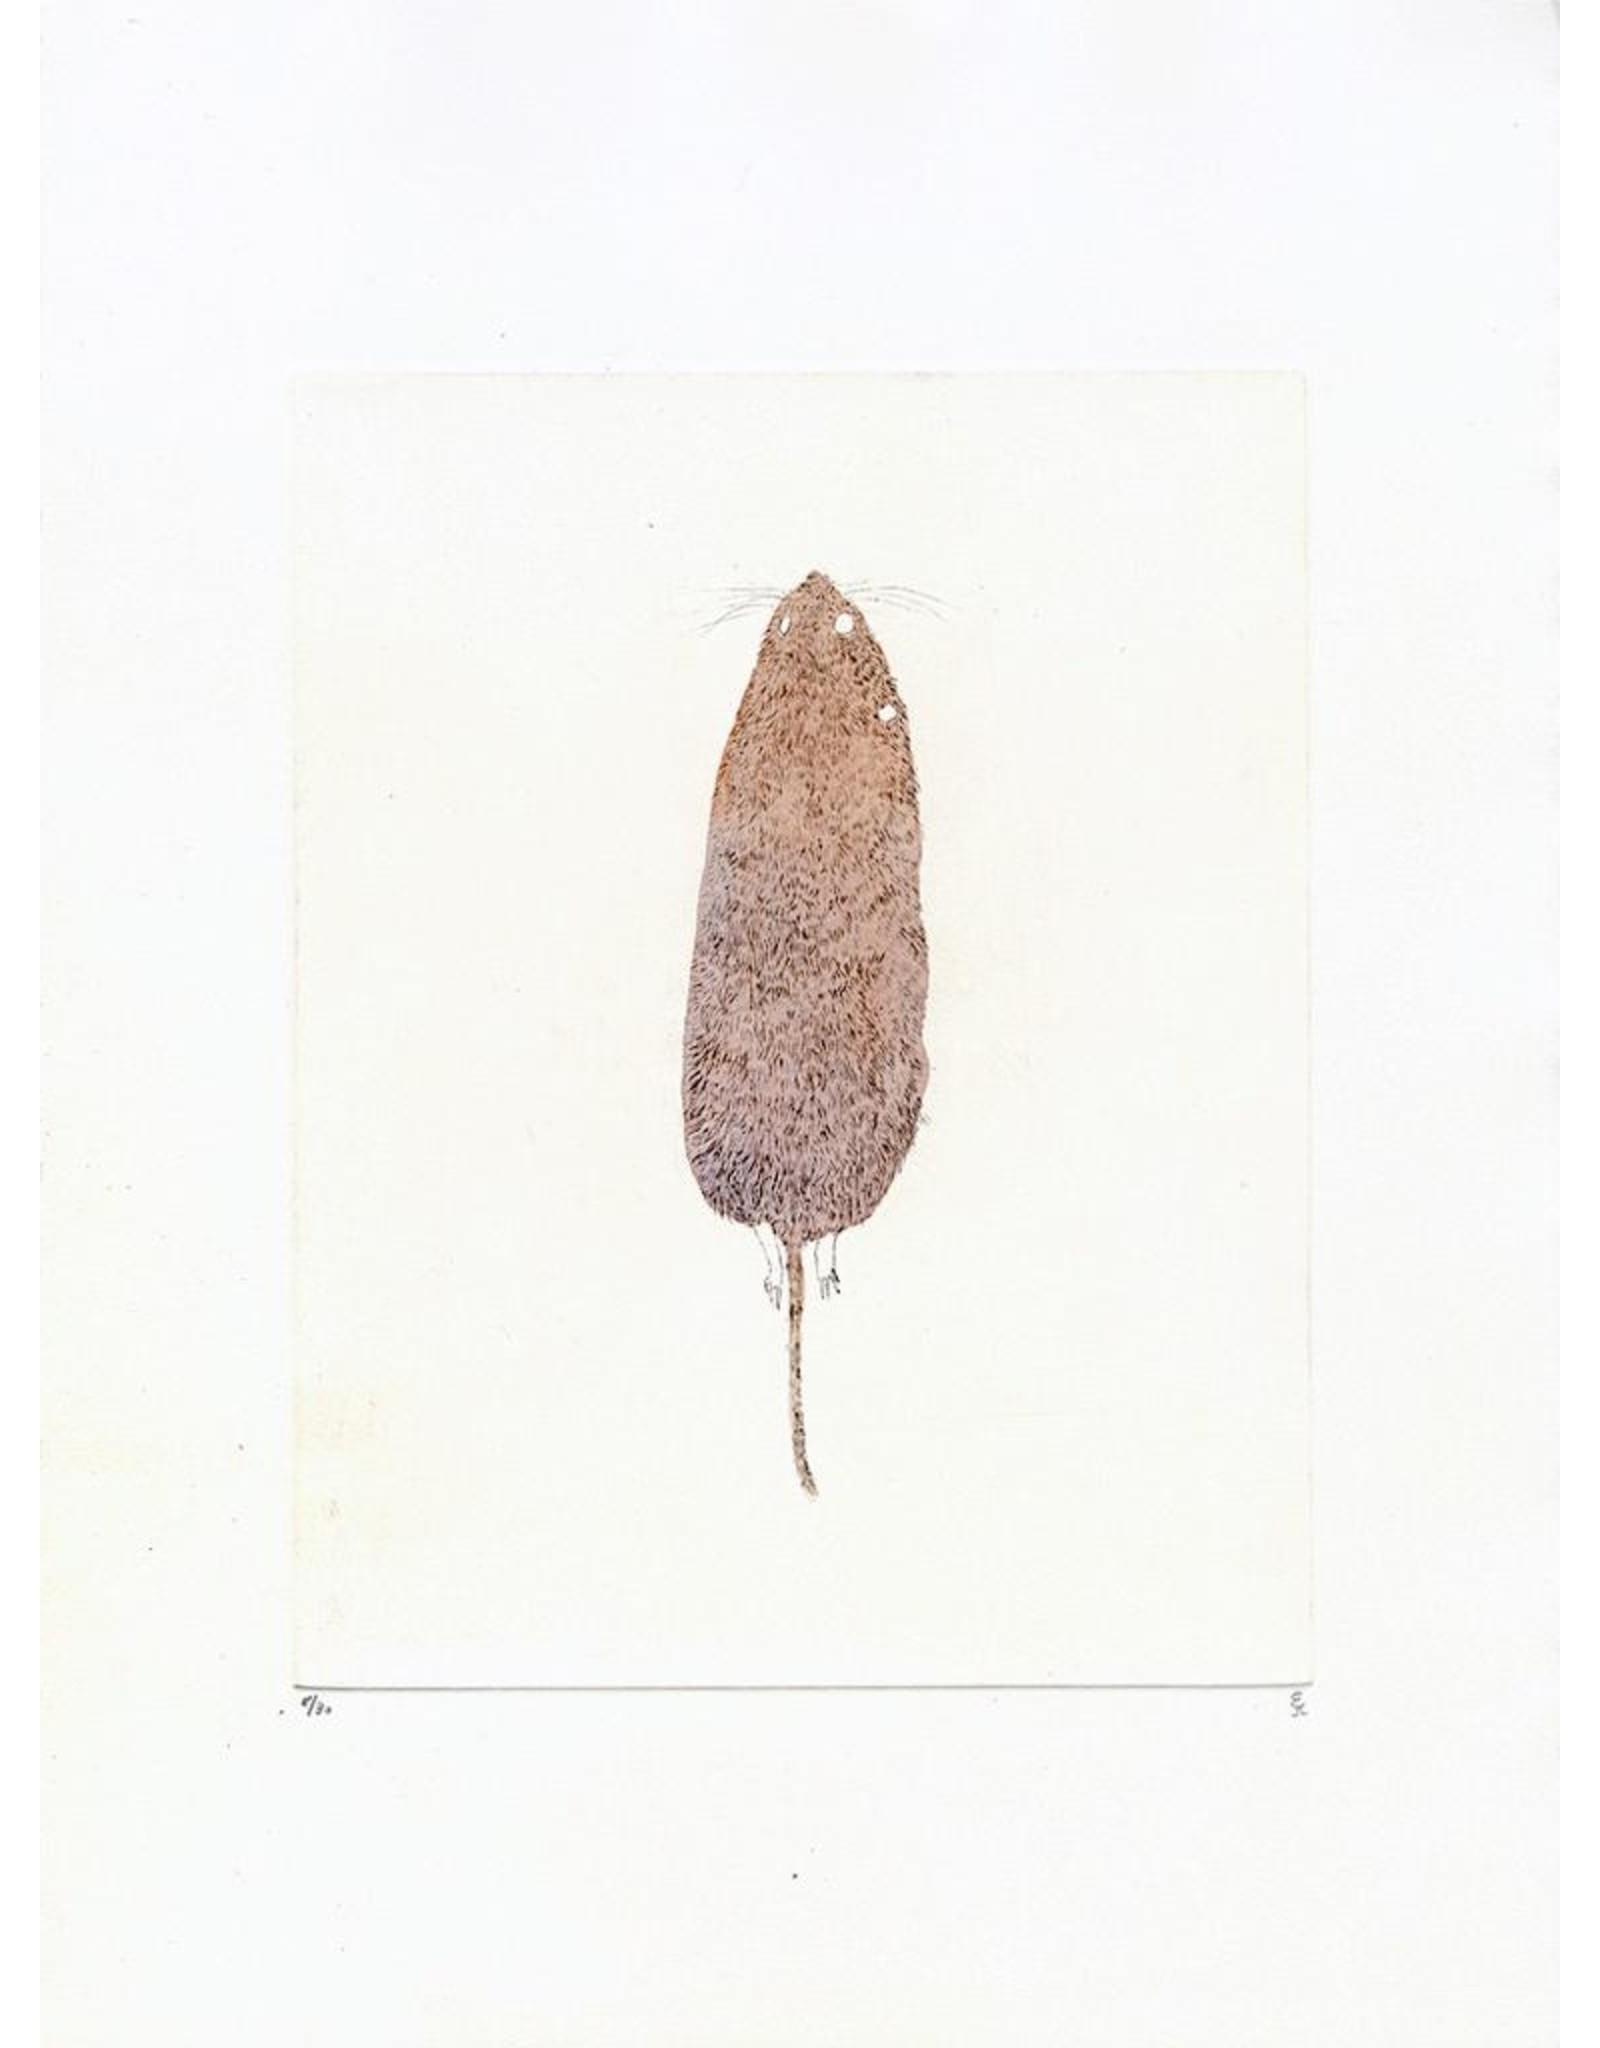 Josephson-Laidlaw, Erin Meadow Vole (from Some Specimens series)